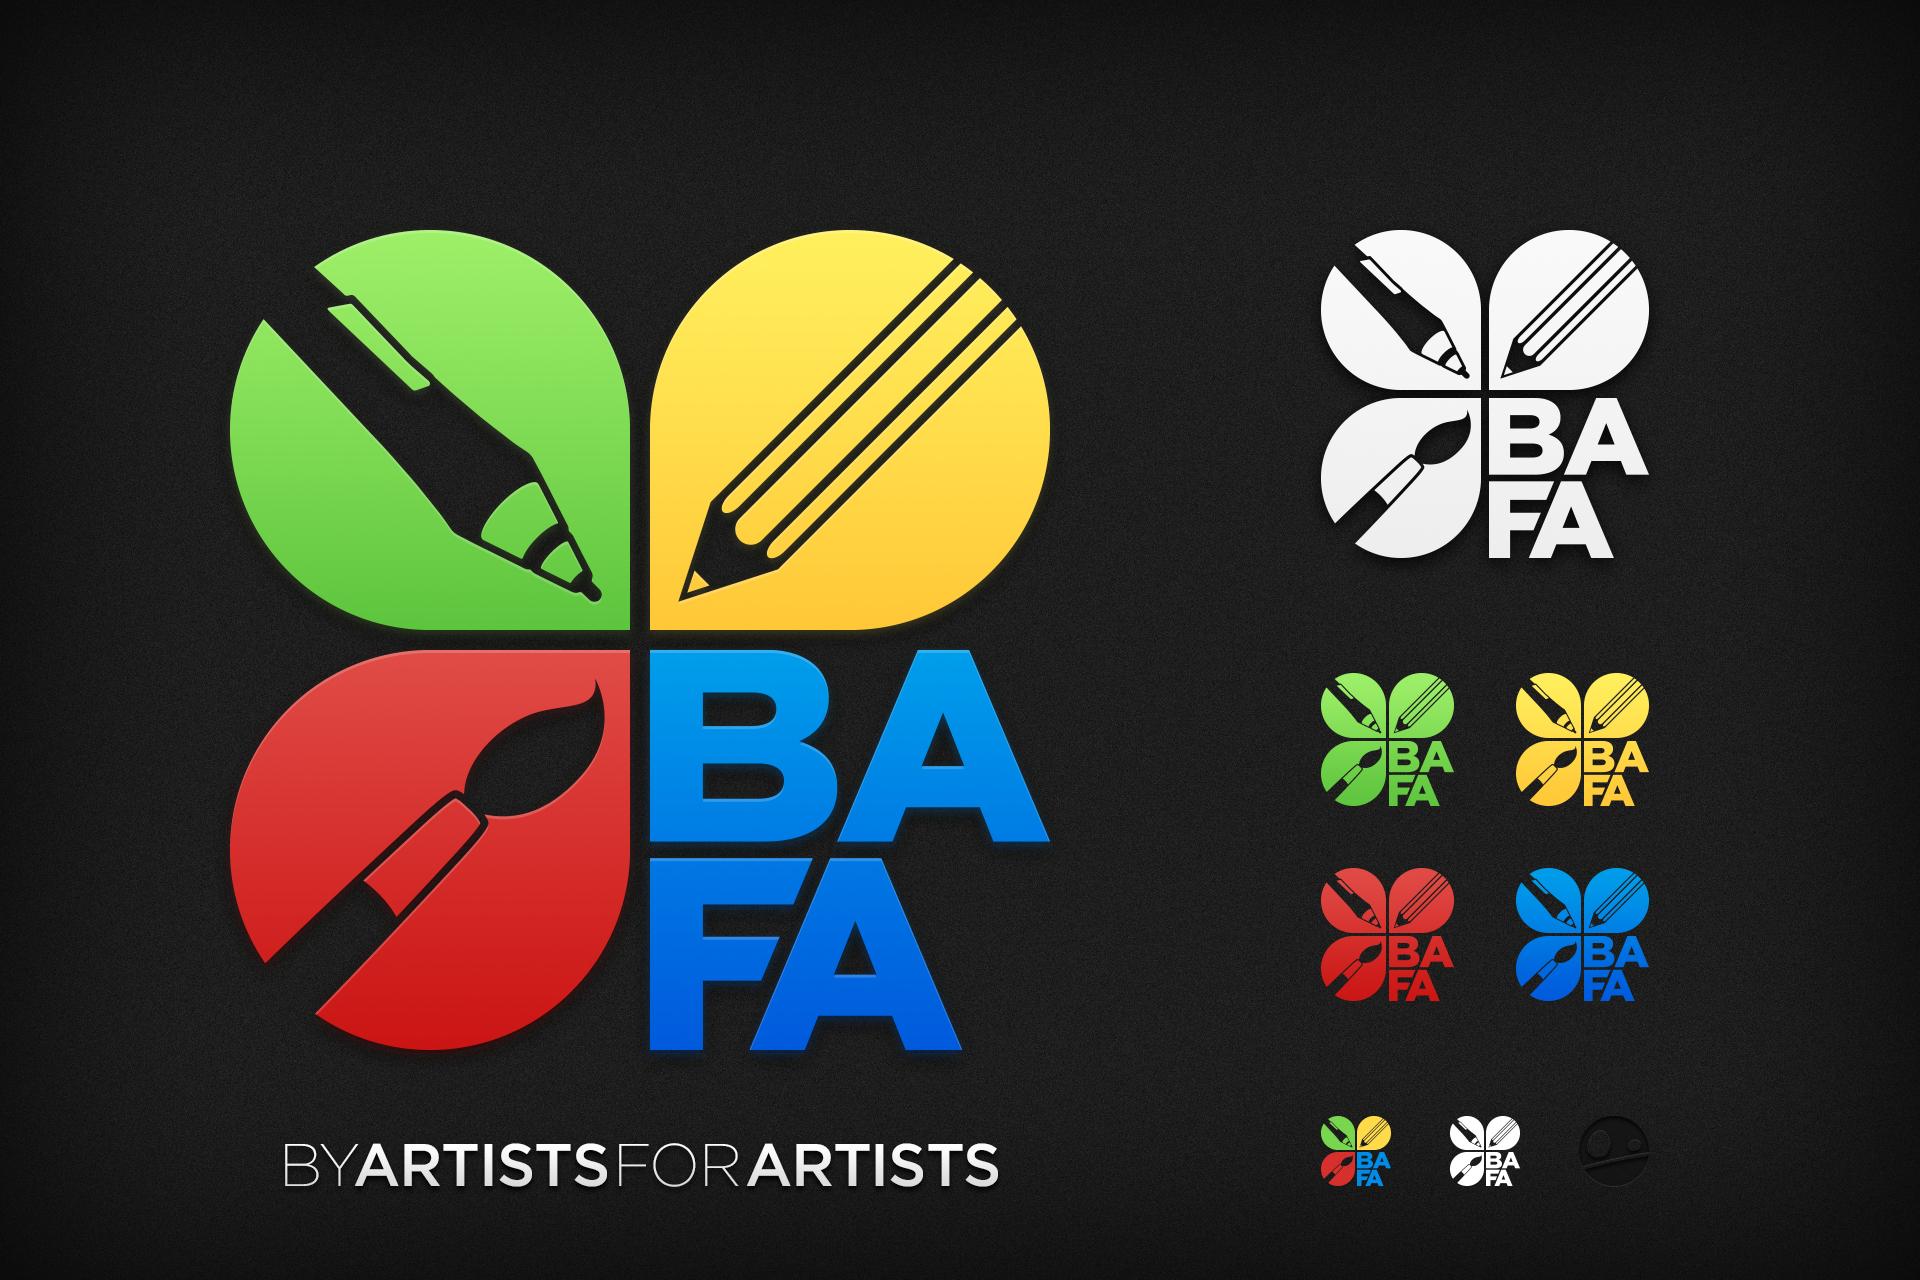 BAFA logo